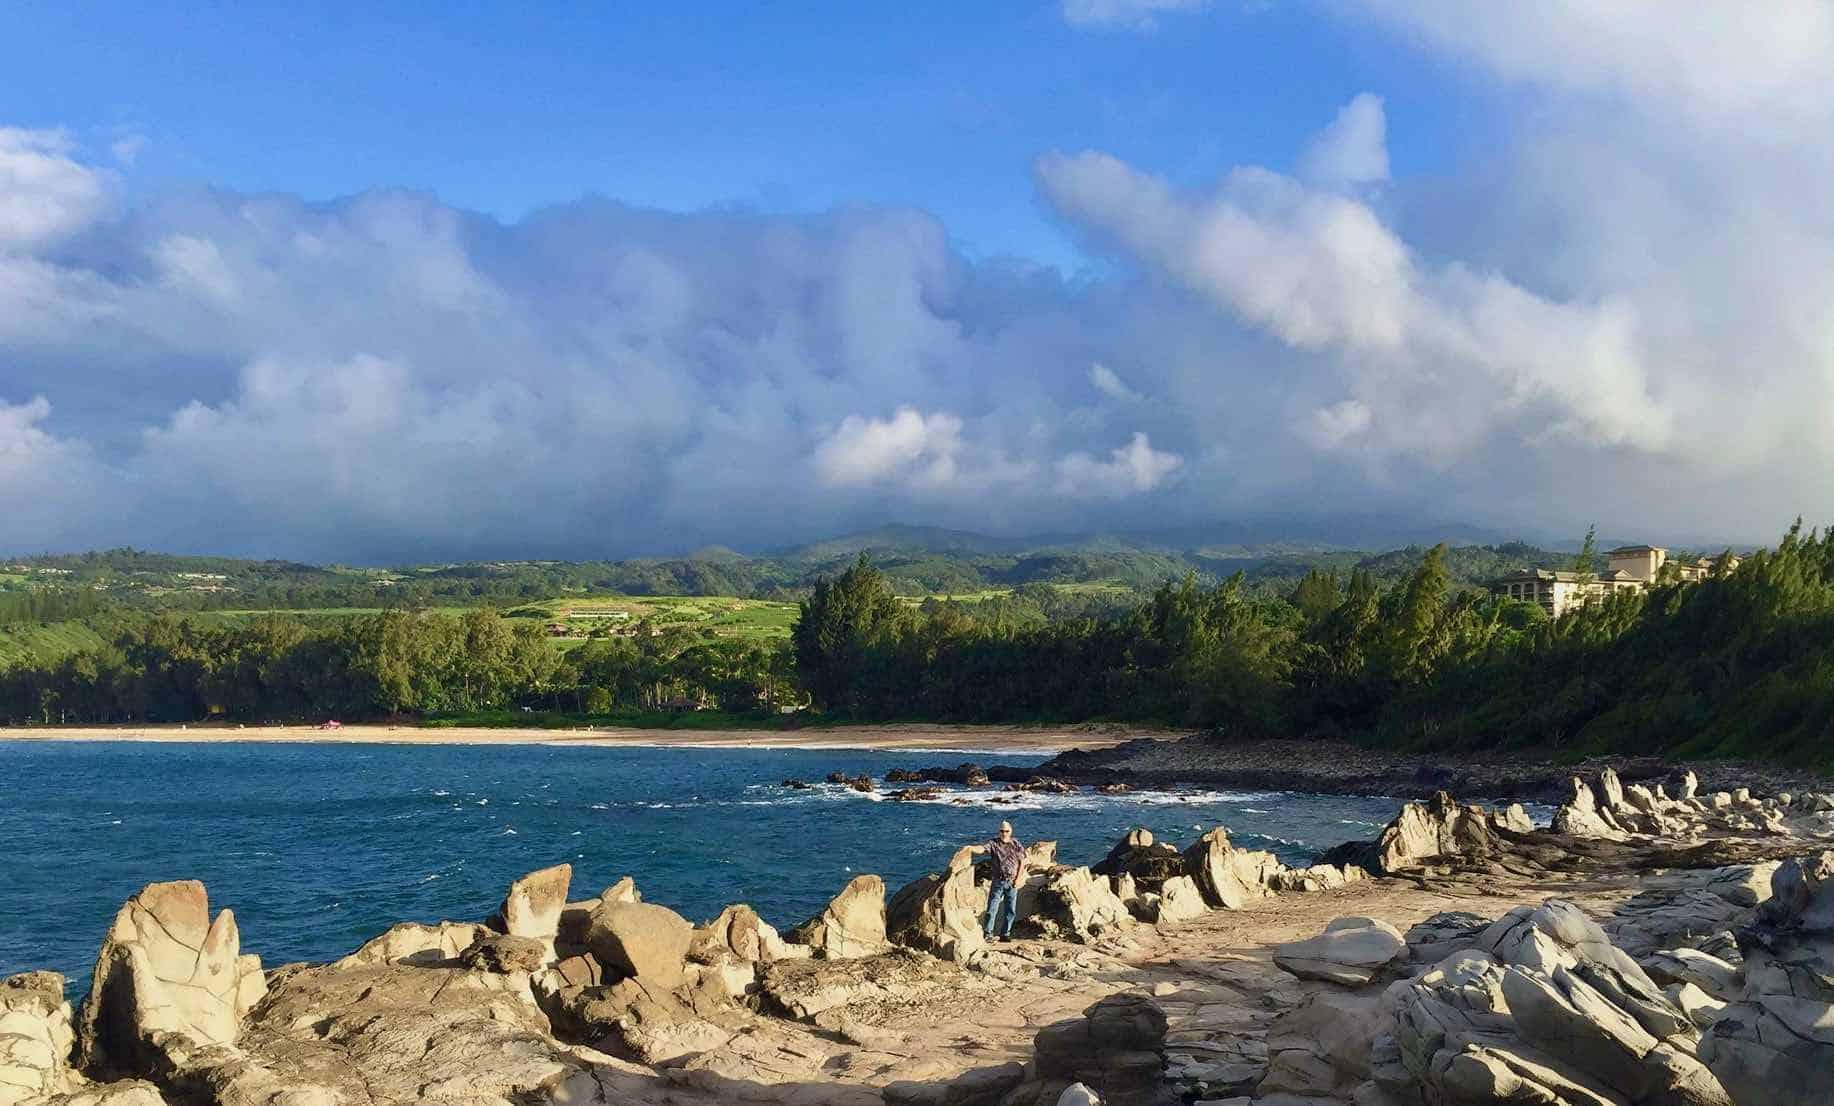 dragons teeth formation in Kapalua Maui